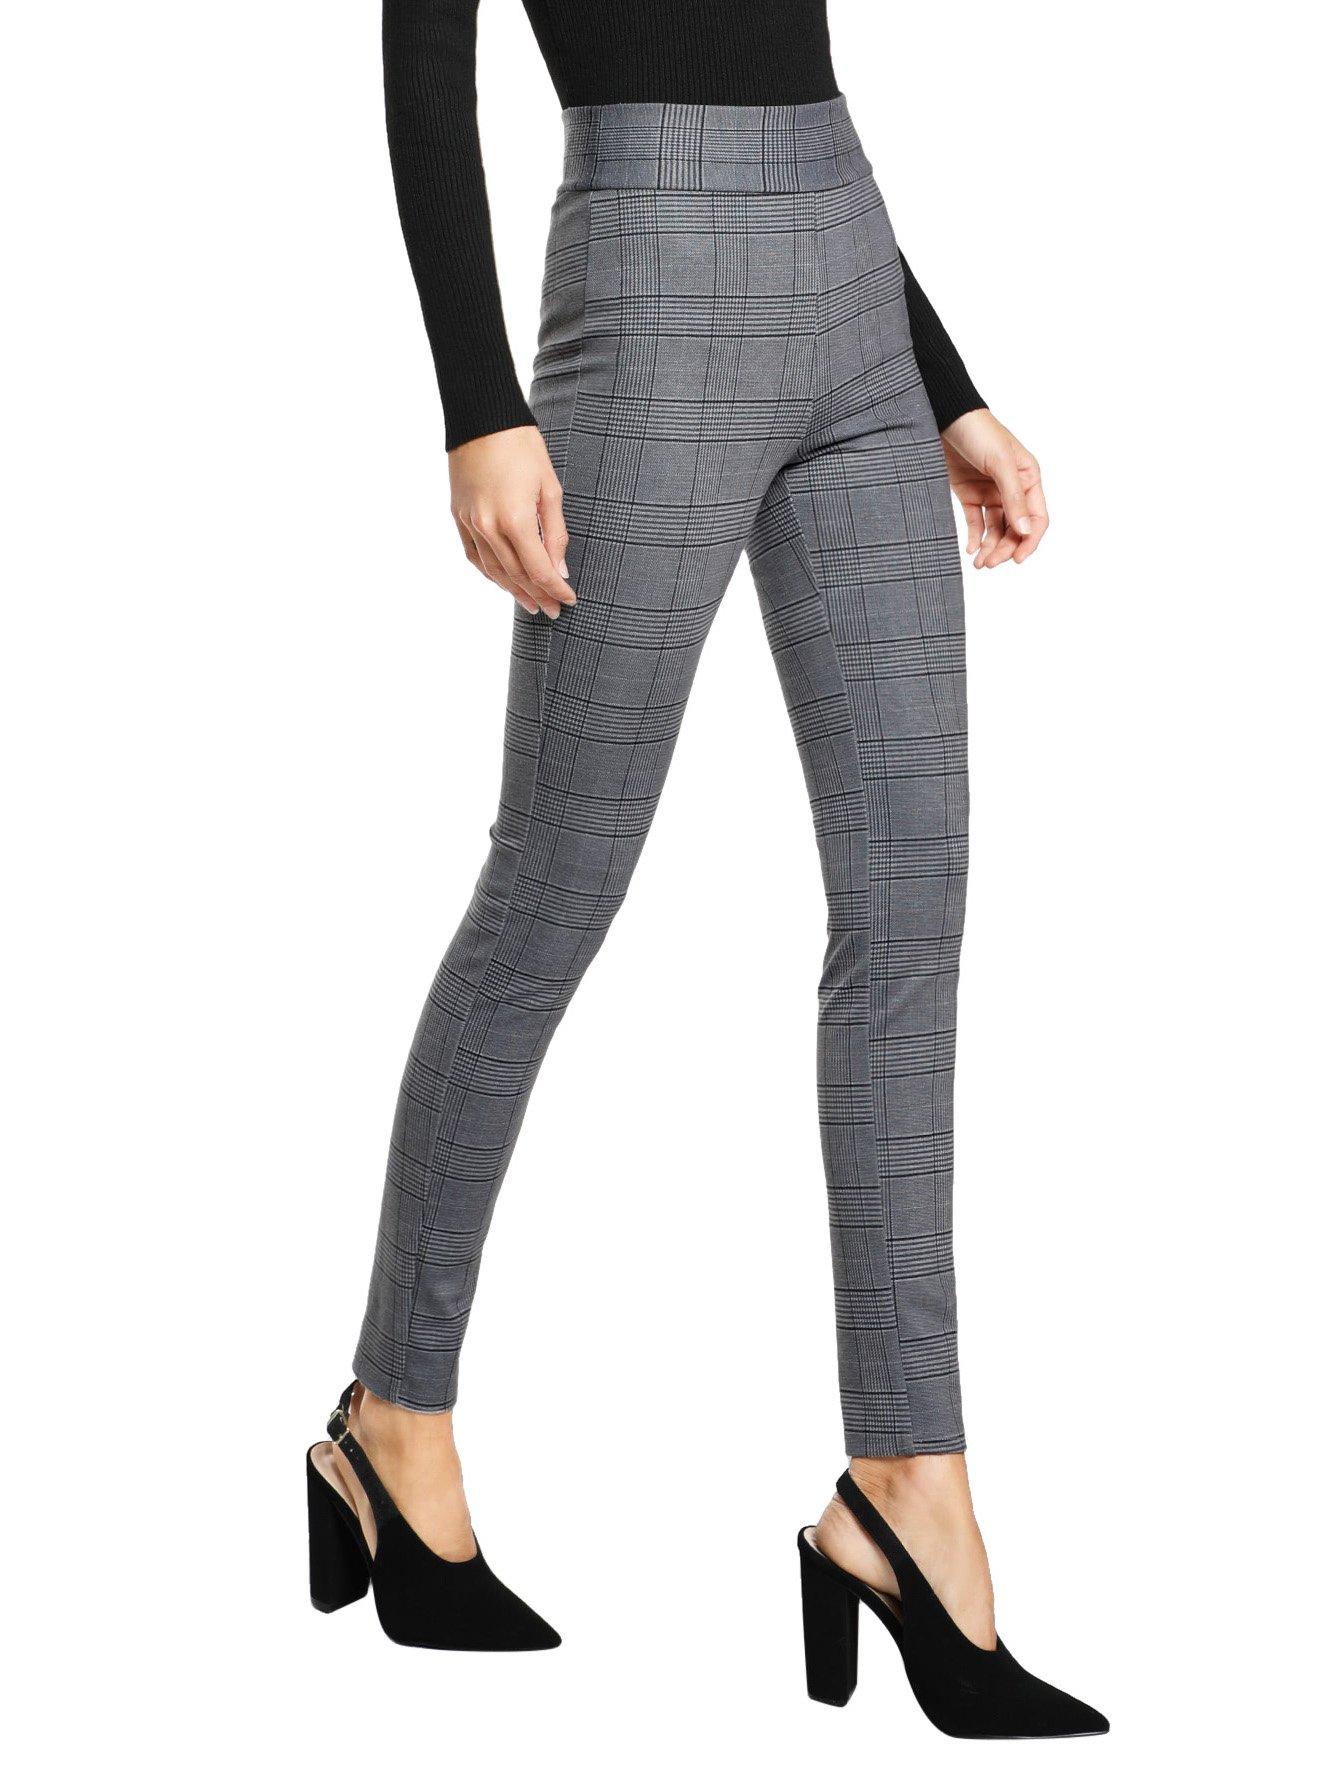 SweatyRocks Women's Casual High Waisted Ankle Plaid Pants Skinny Leggings, Grey #1, L by SweatyRocks (Image #3)